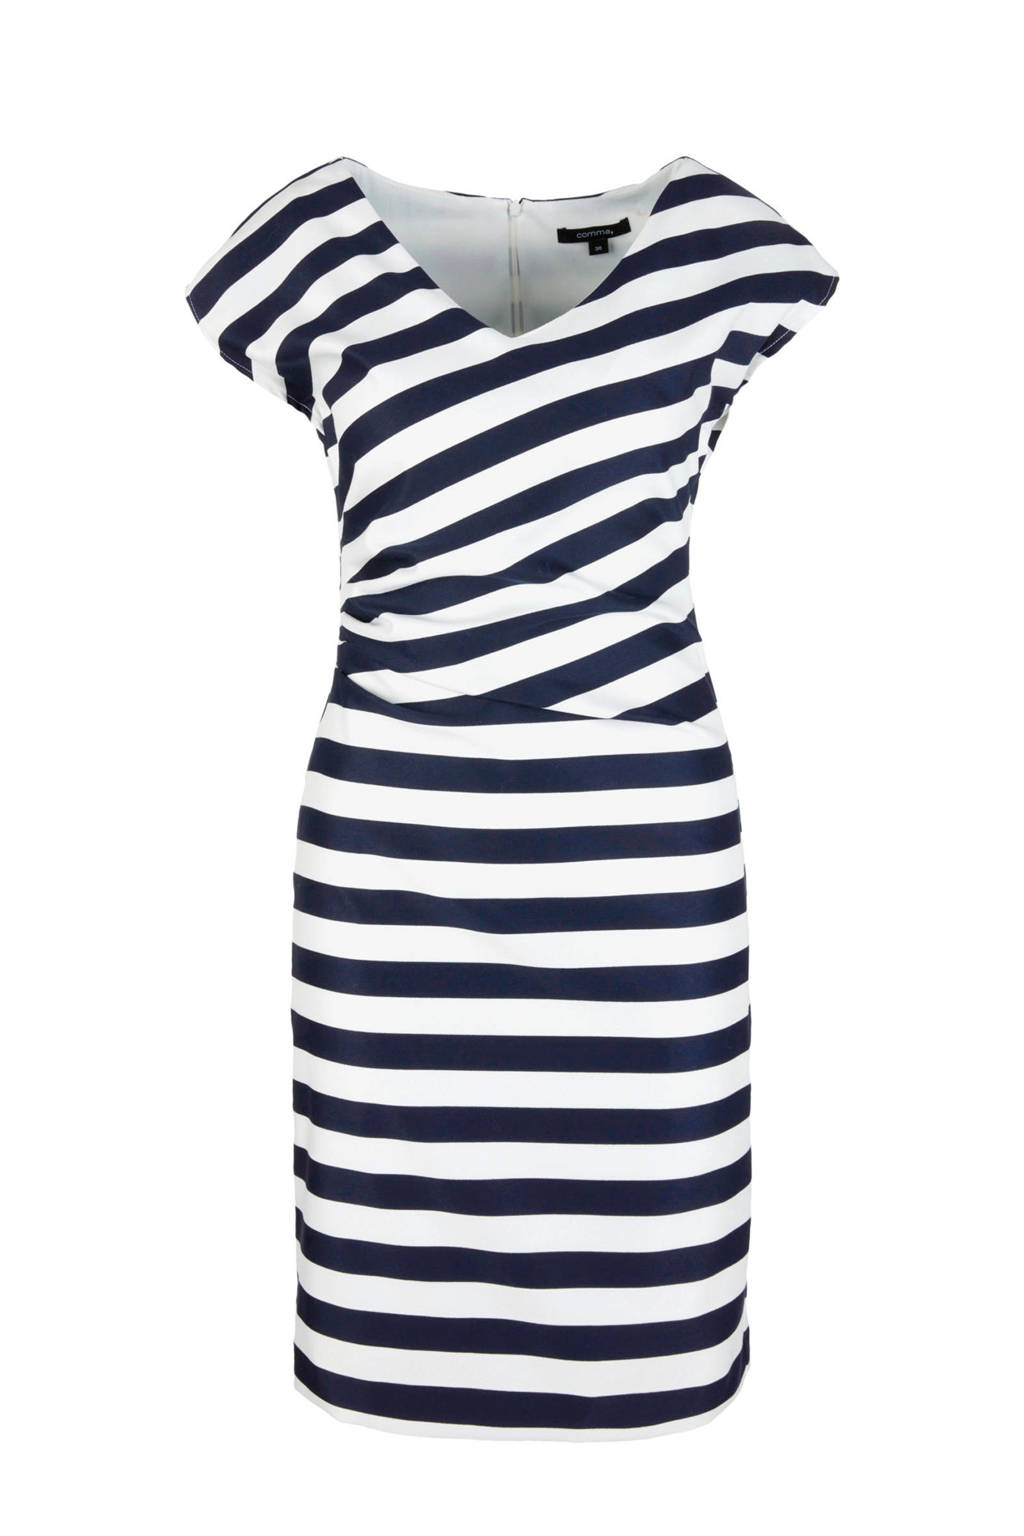 comma gestreepte jurk met plooidetail blauw/ecru, Blauw/ecru